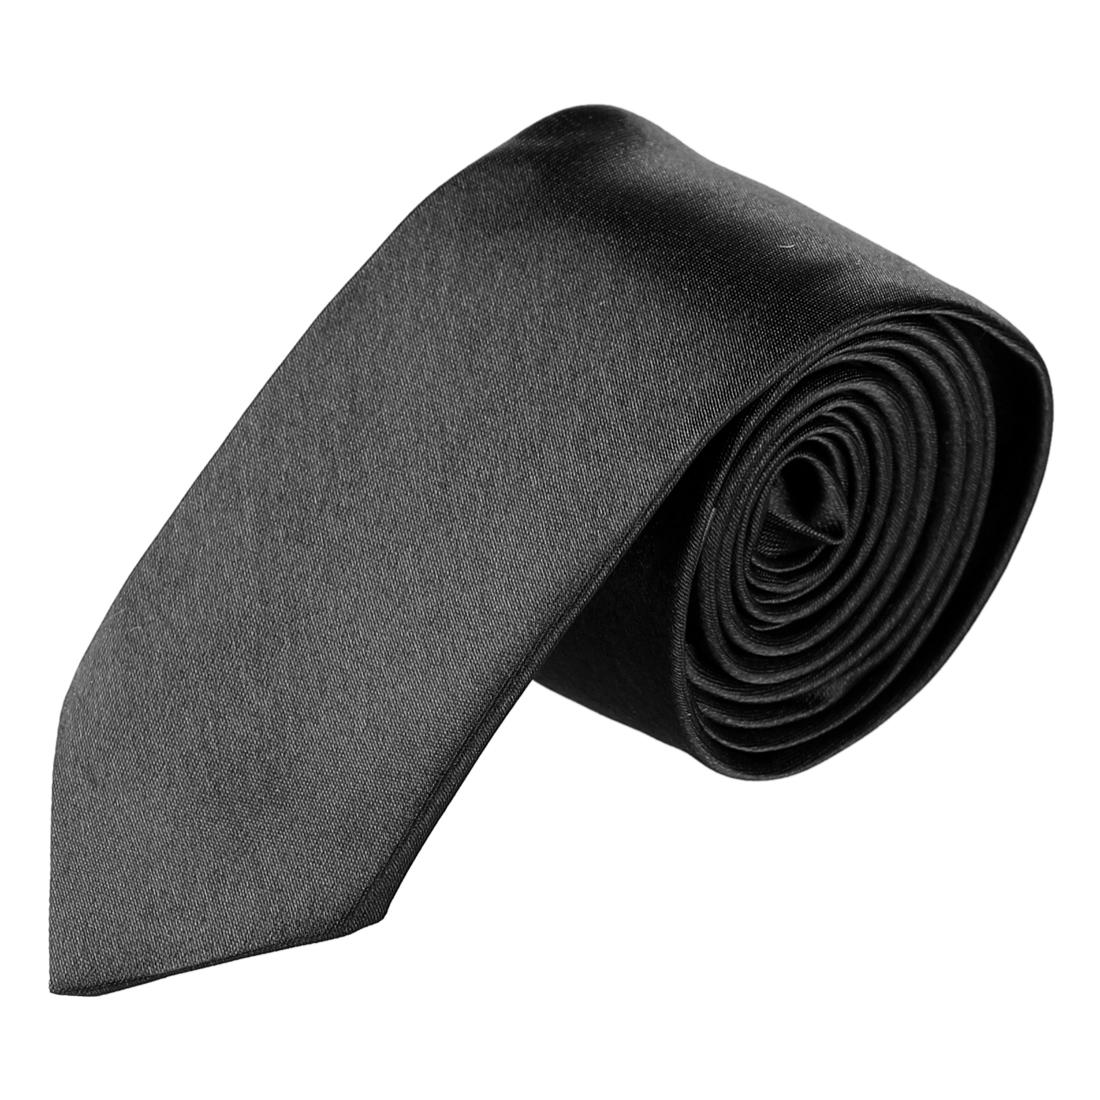 Men Bussiness Party Self Tie Neckwear Clothes Decor Slim Necktie Black